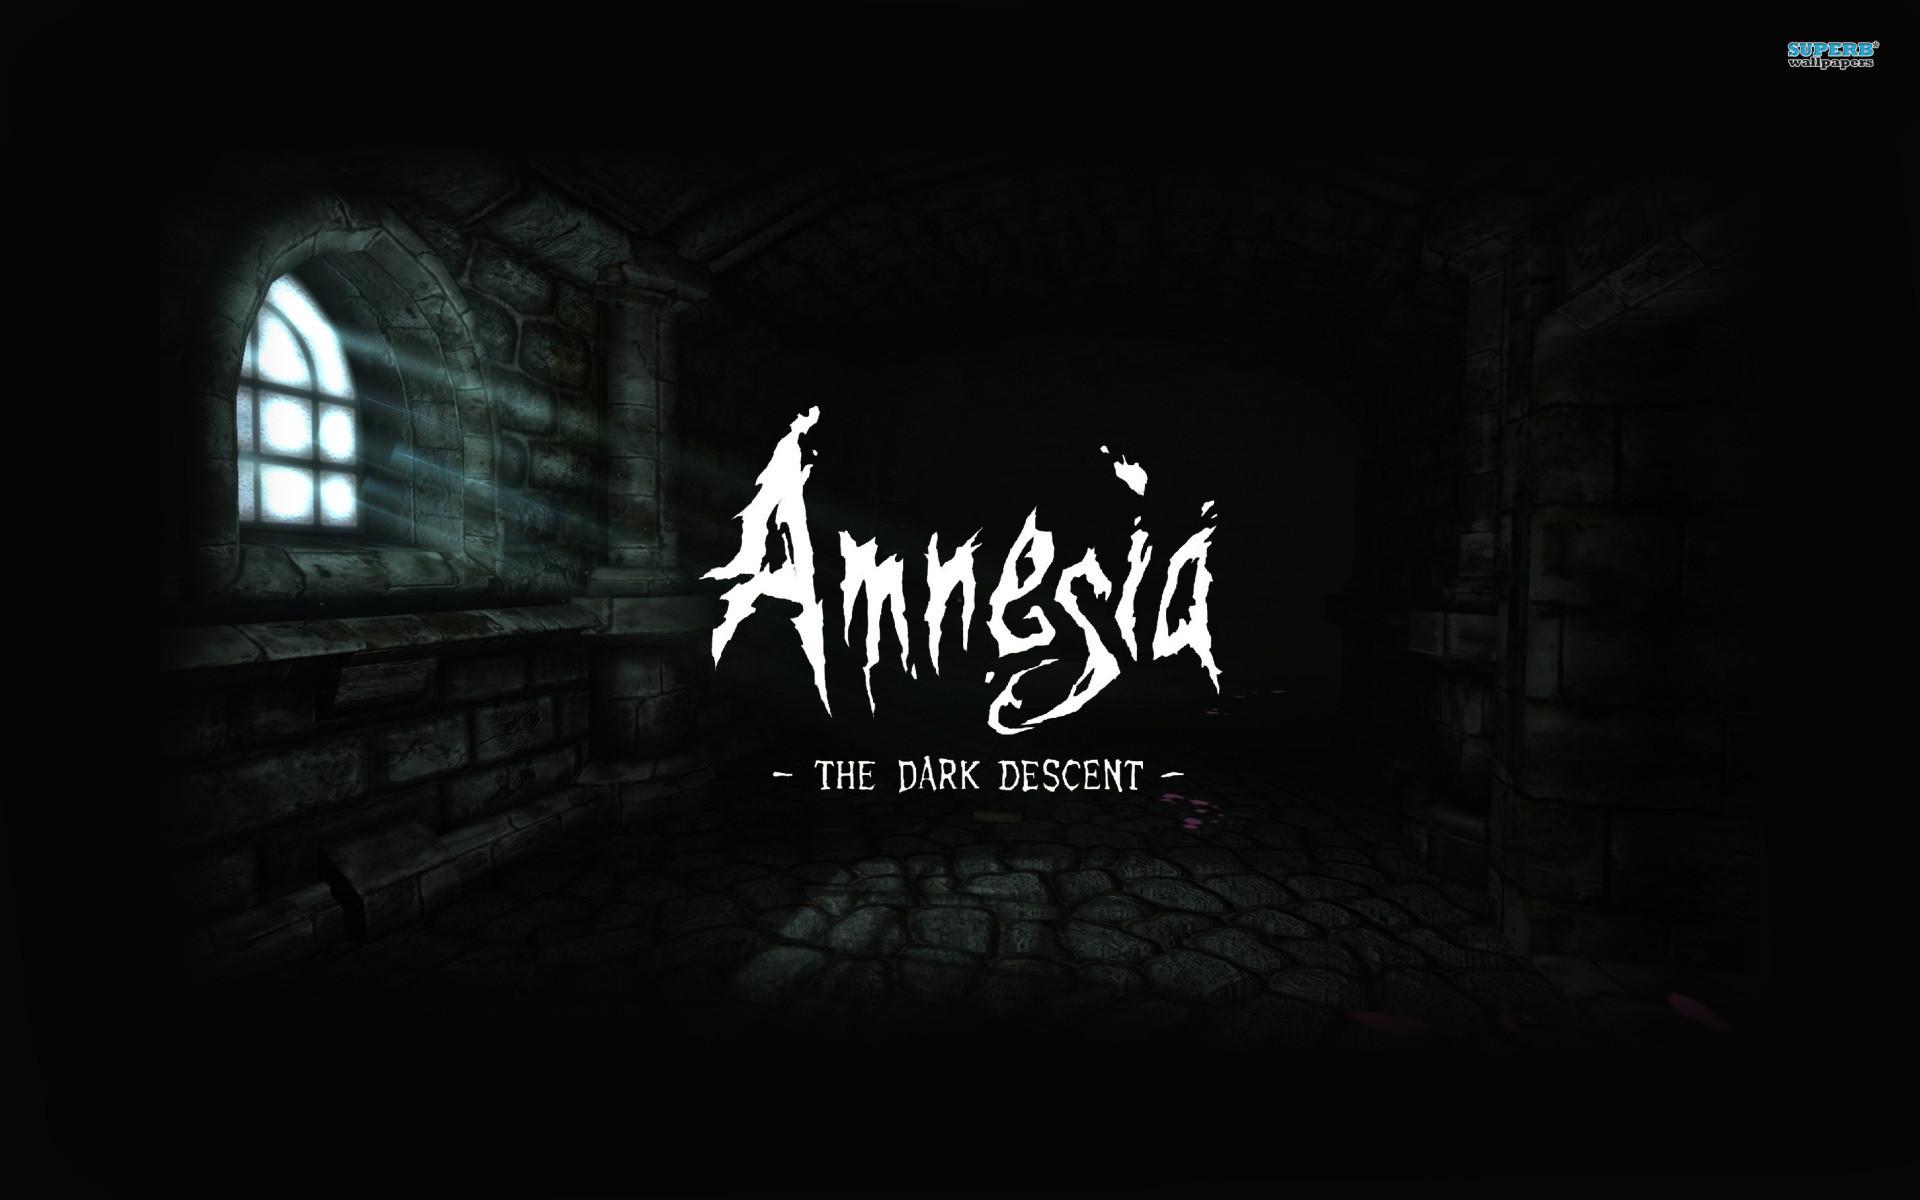 Amnesia The Dark Descent Wallpaper 86 Images